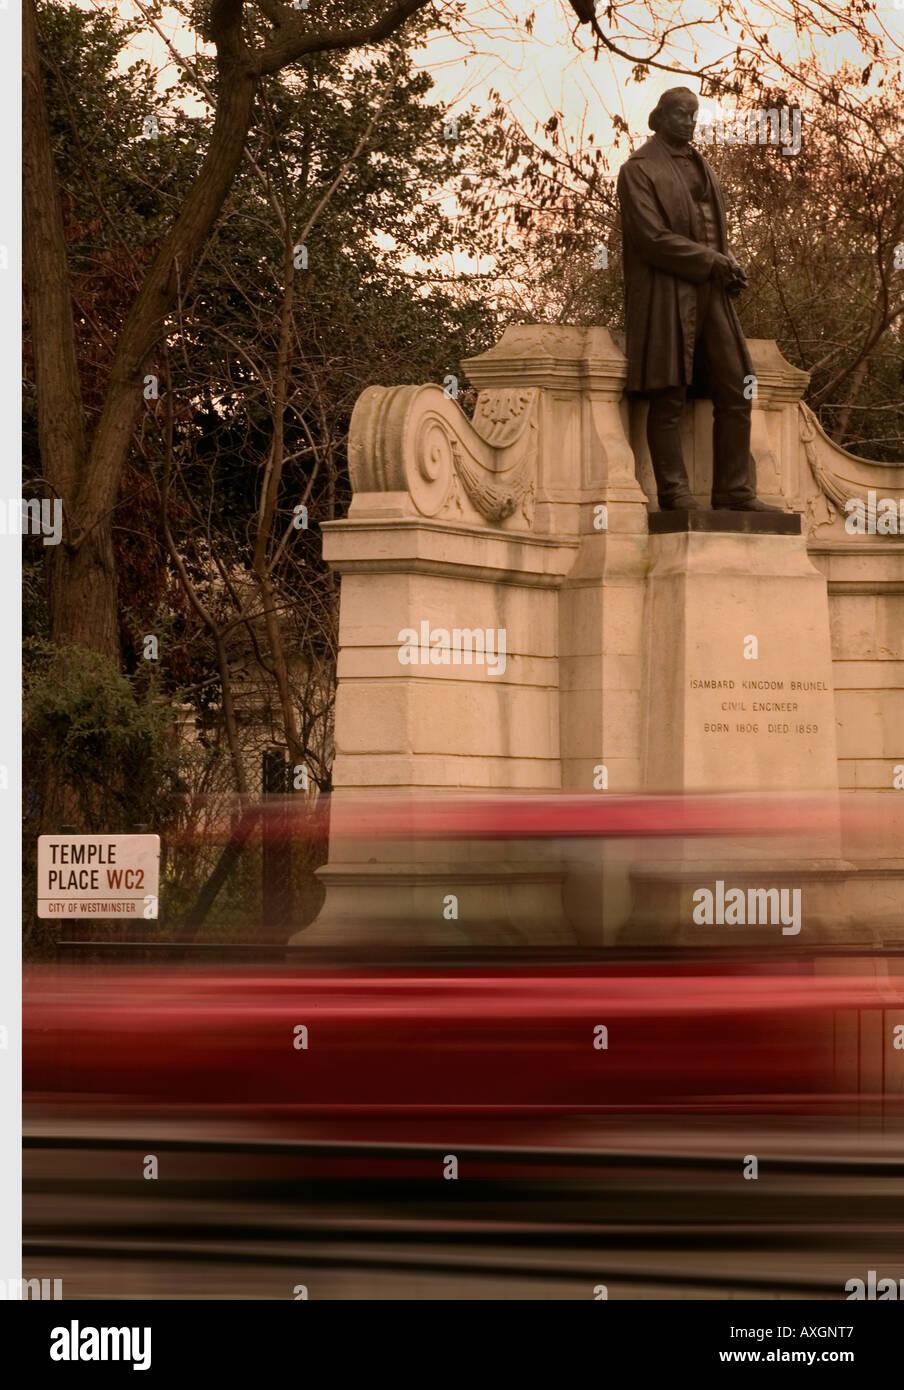 Isambard Kingdom Brunel statue on the embankment London UK - Stock Image